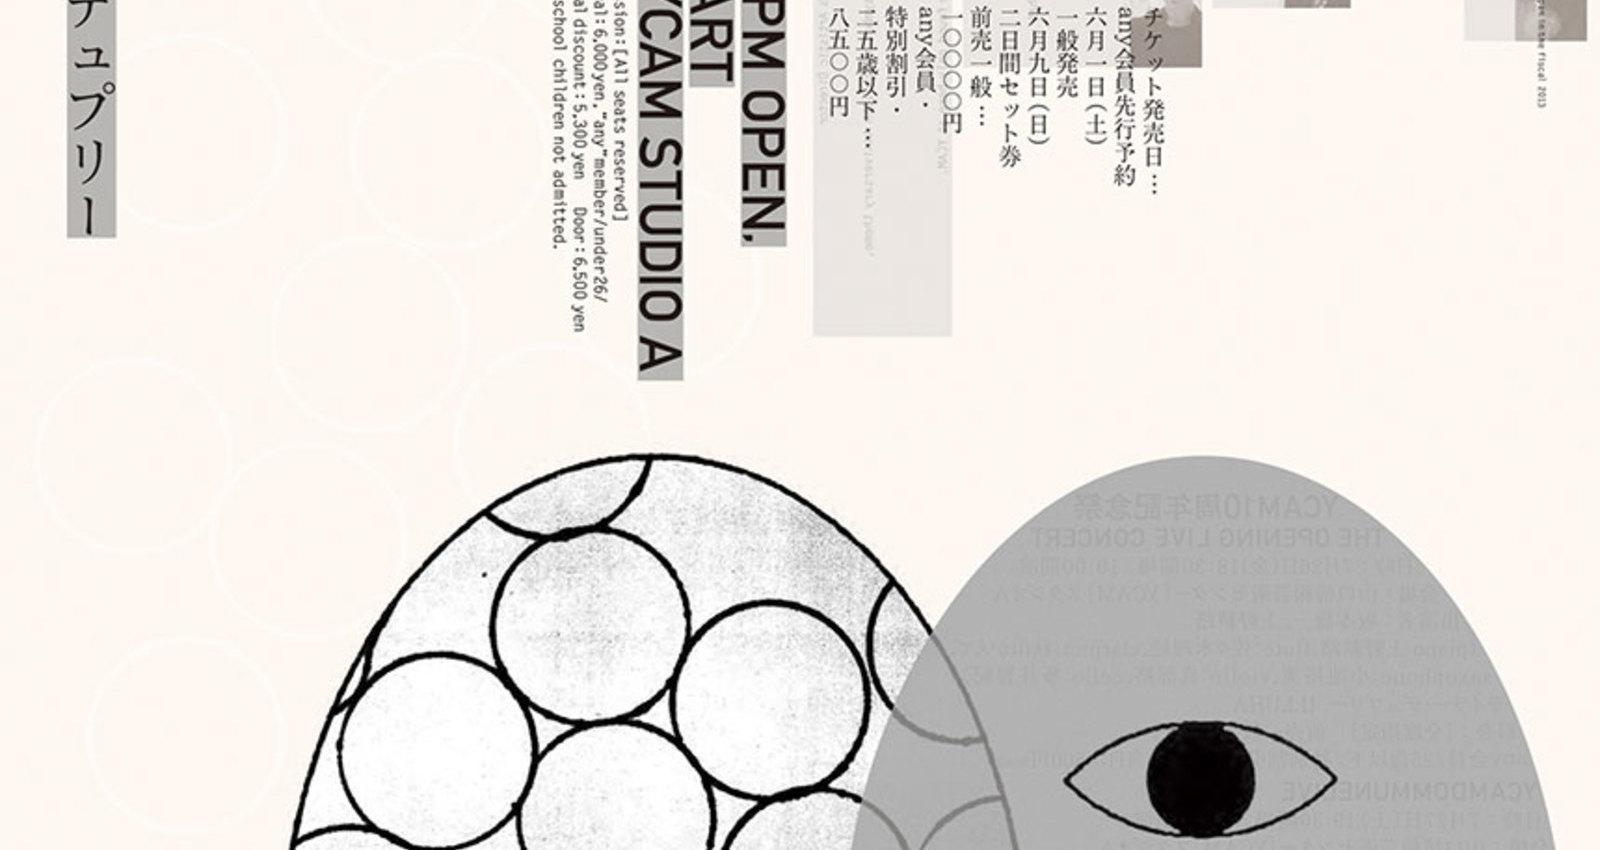 Ryuichi Sakamoto's concerts